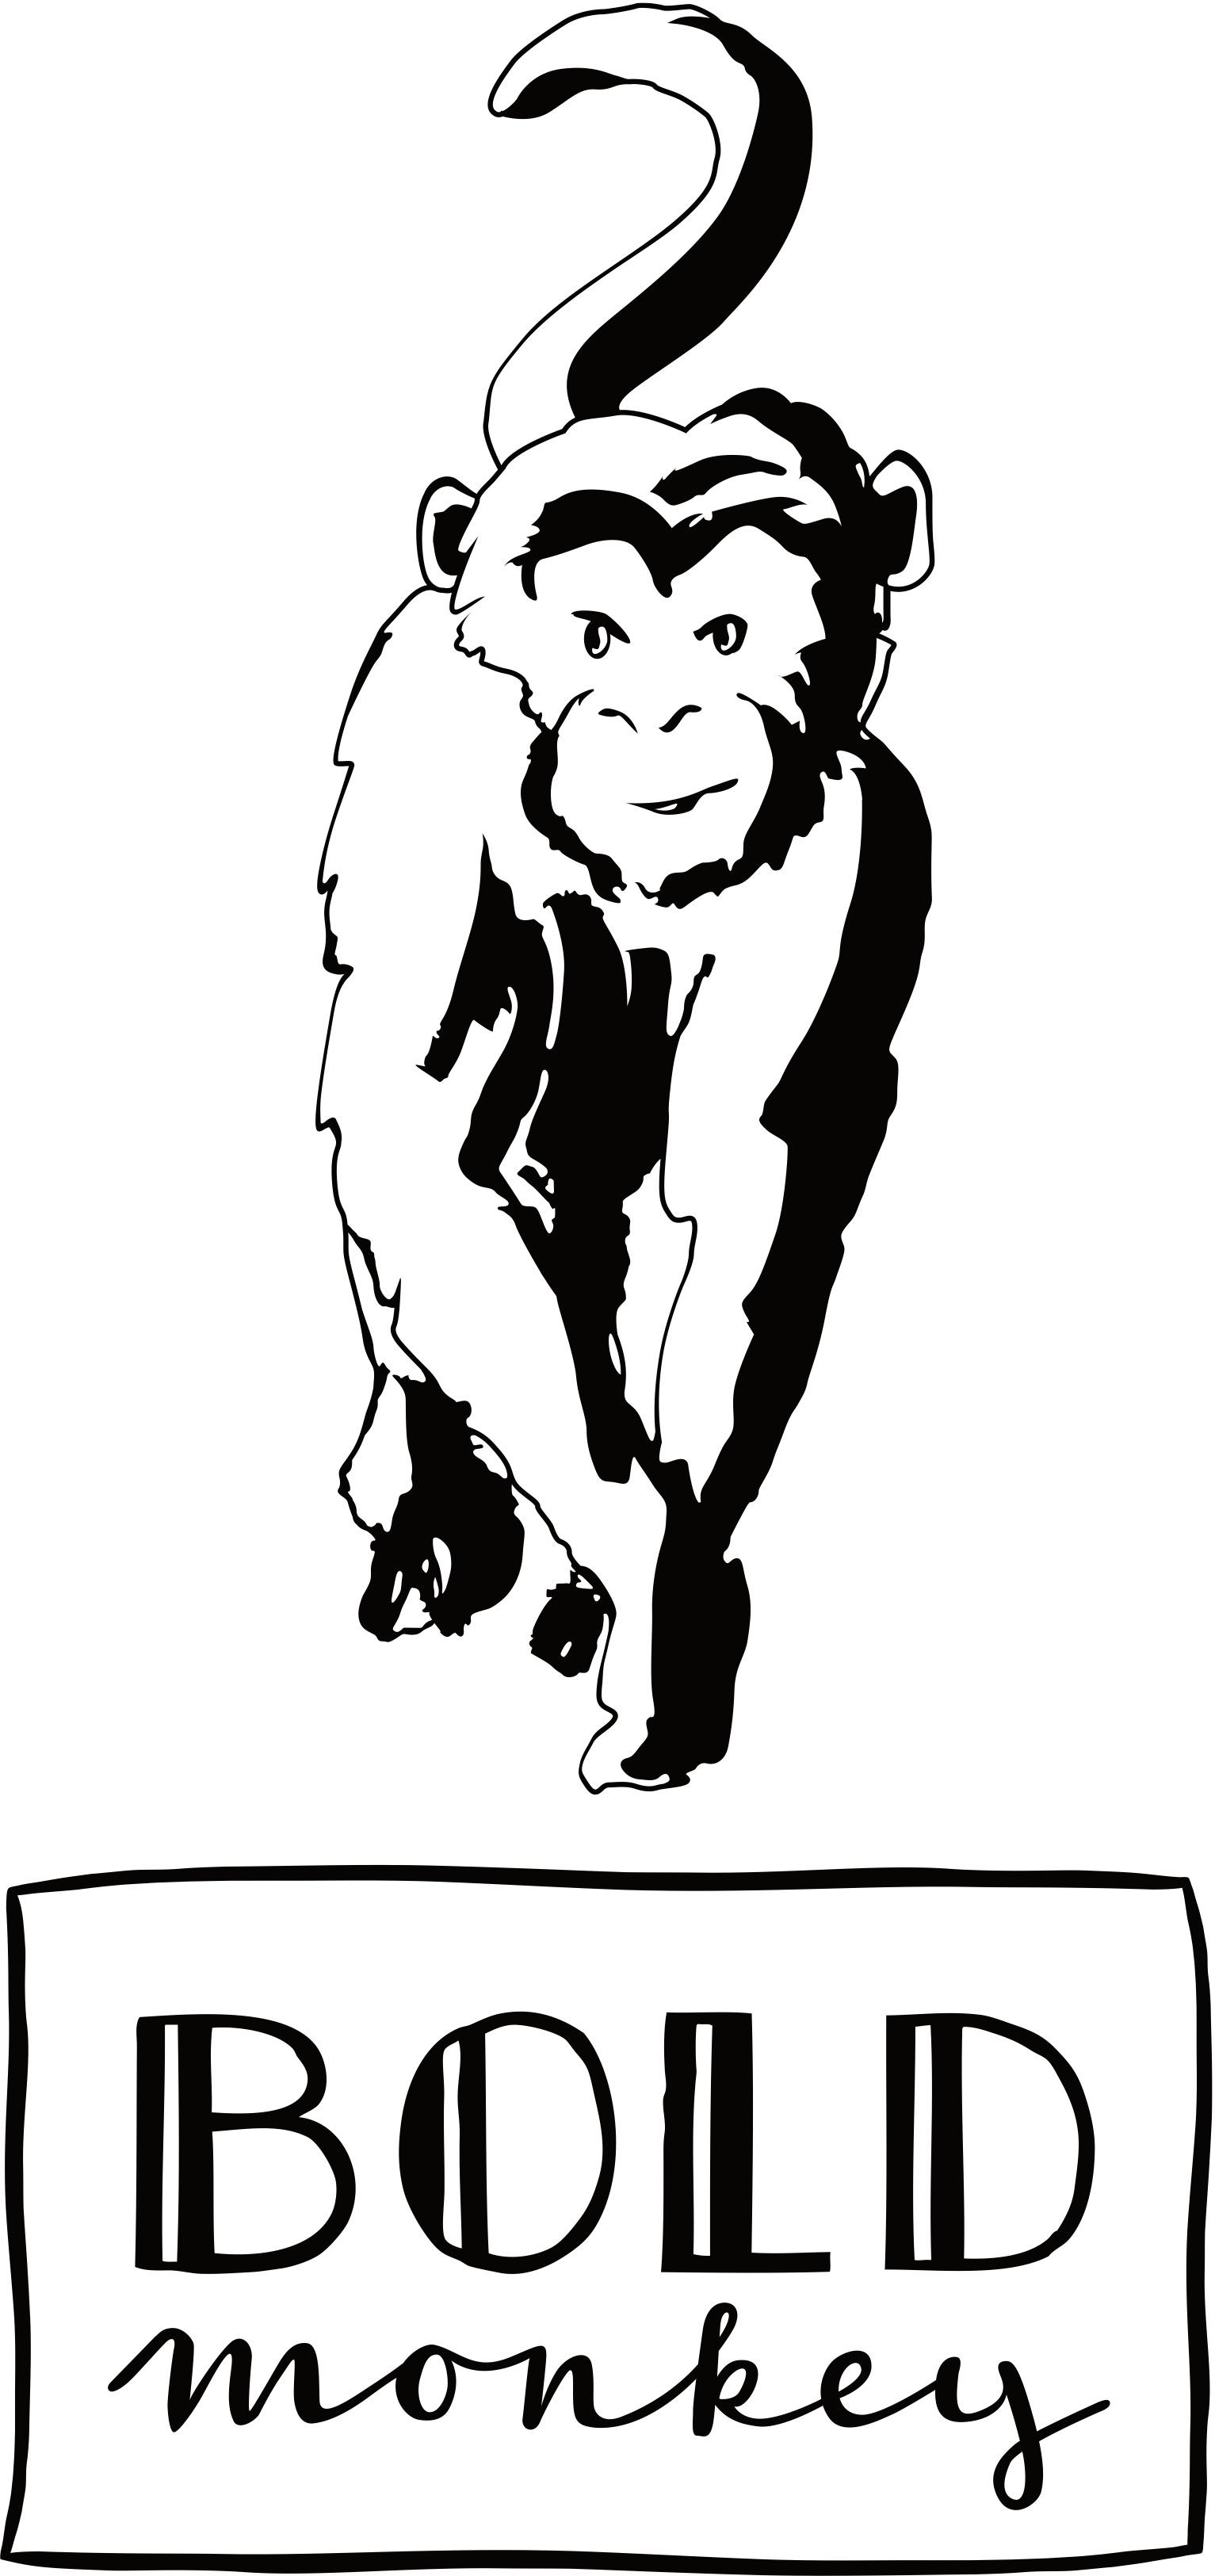 bold monkey Swinging Lines vloerkleed 160x230 zwart grafisch art deco